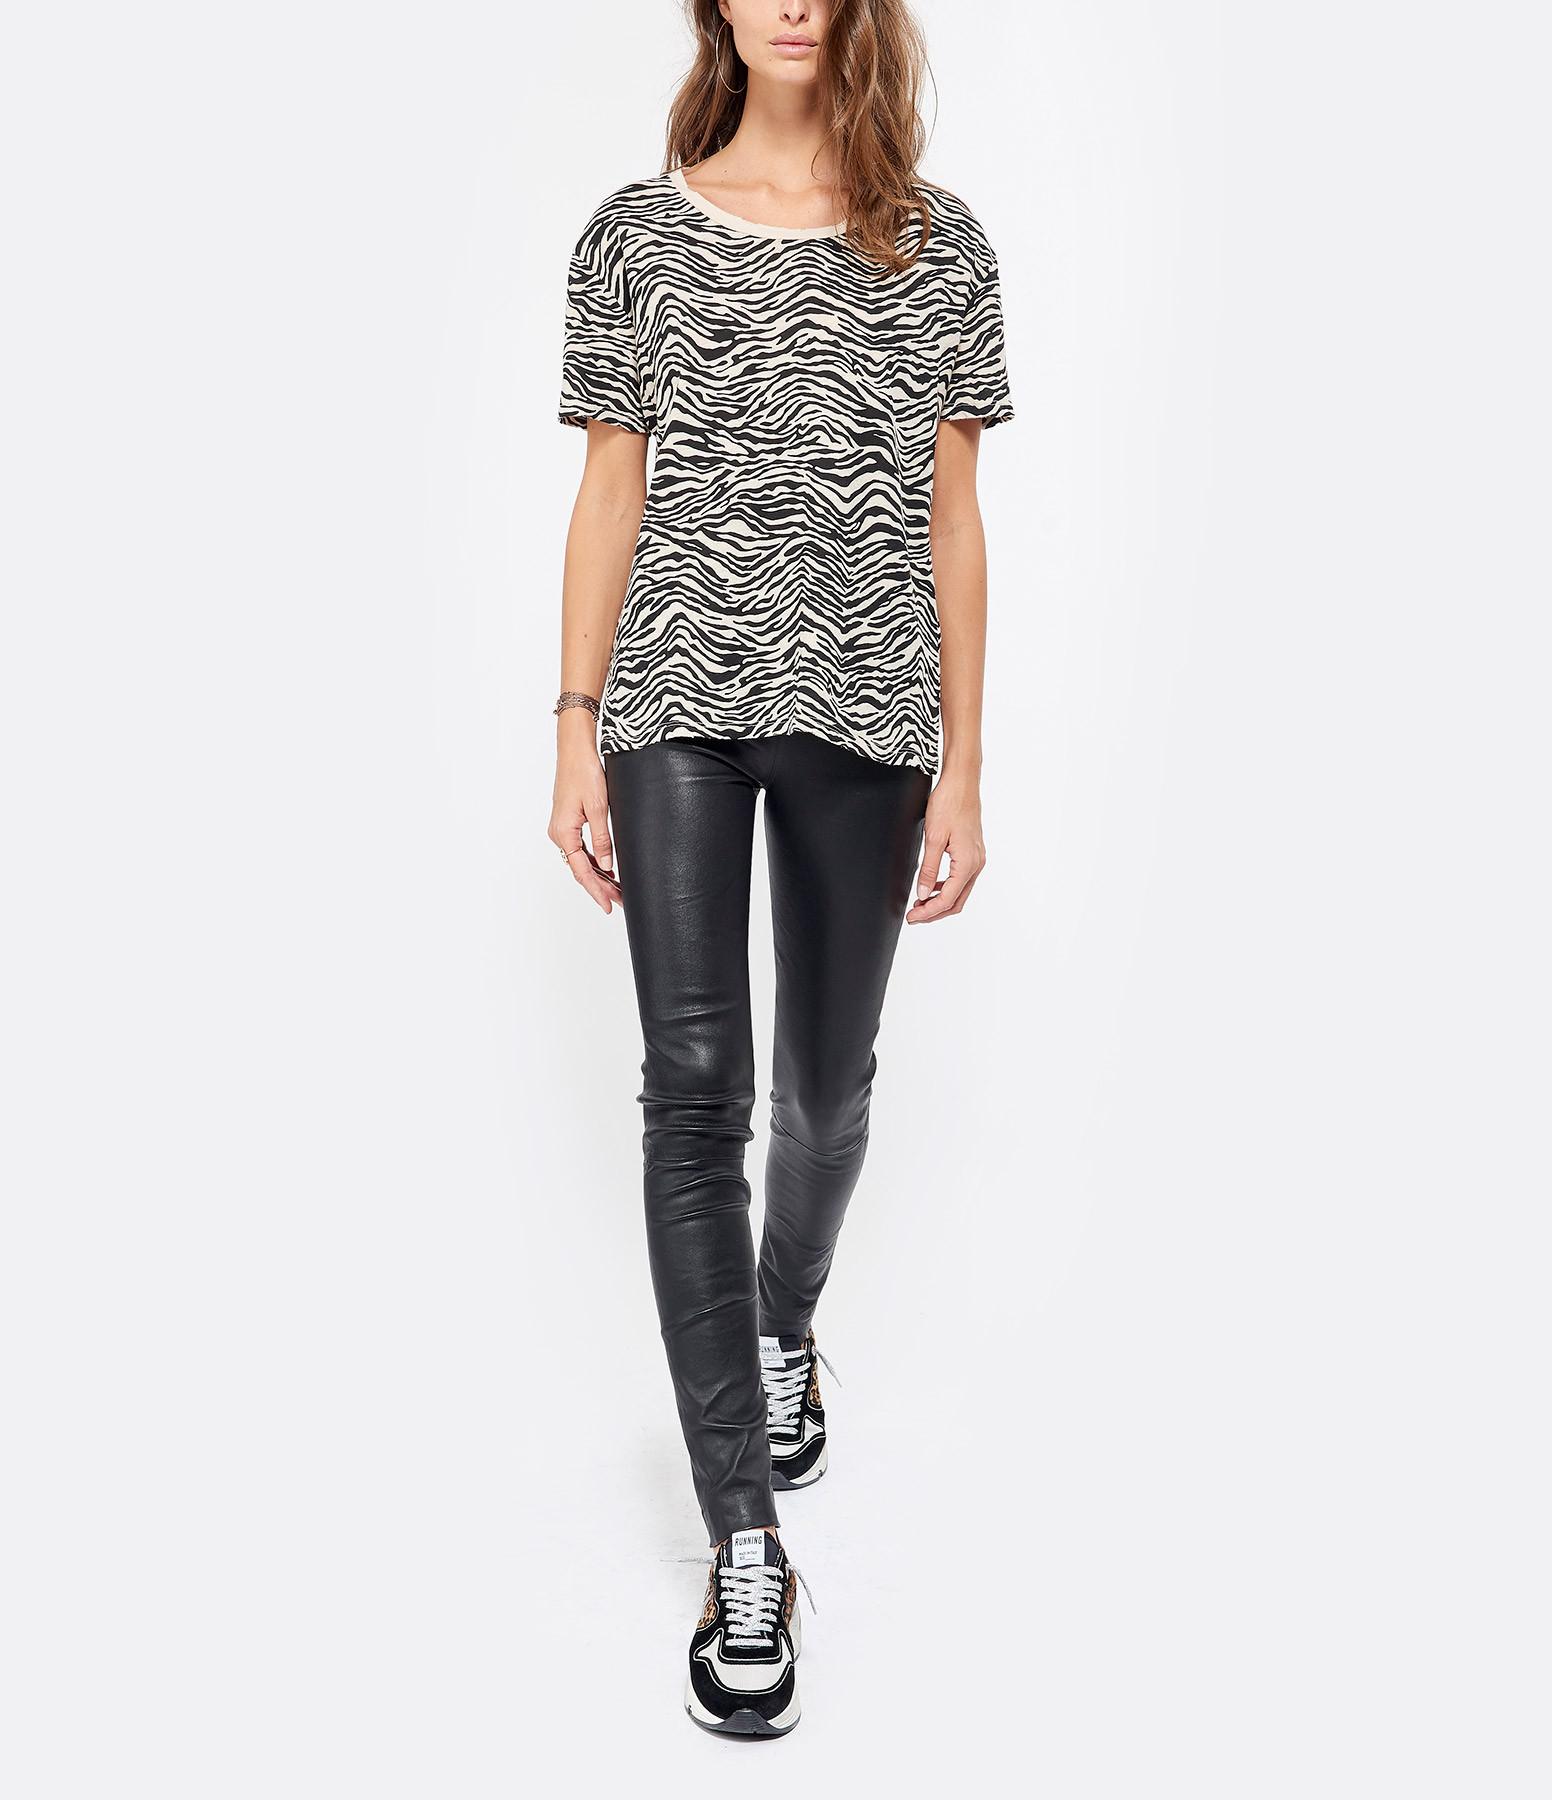 JUNE 7.2 - Tee-shirt Tatum Zebra Coton Lin Sable Noir